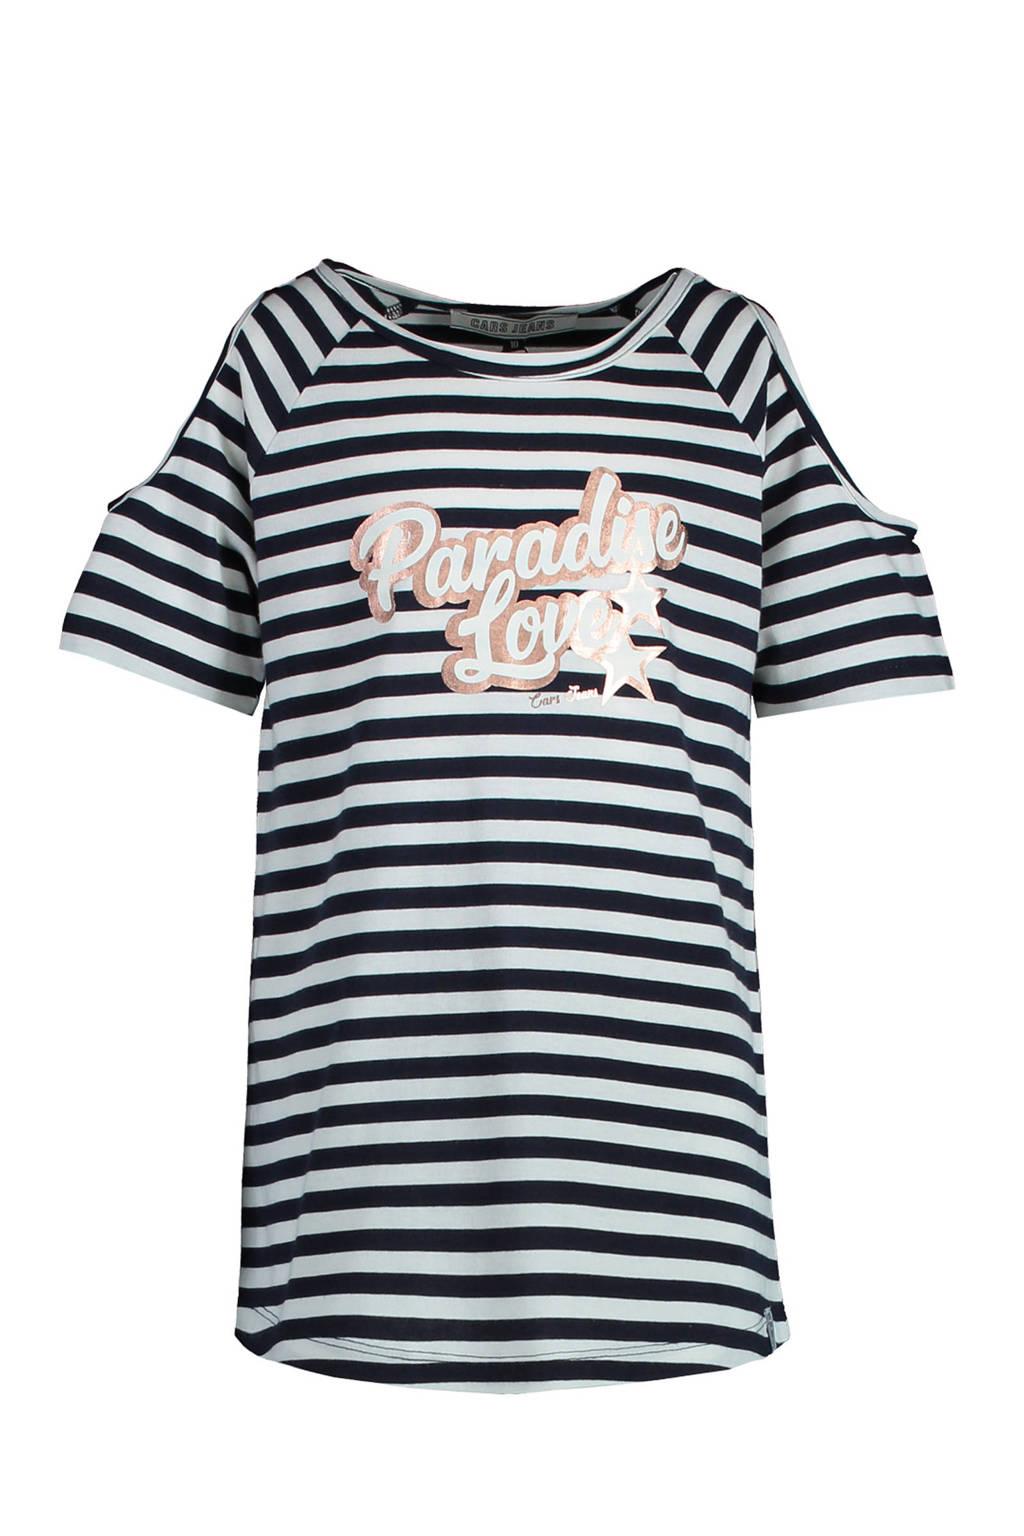 Cars gestreept T-shirt Ovida donkerblauw/wit, Donkerblauw/wit